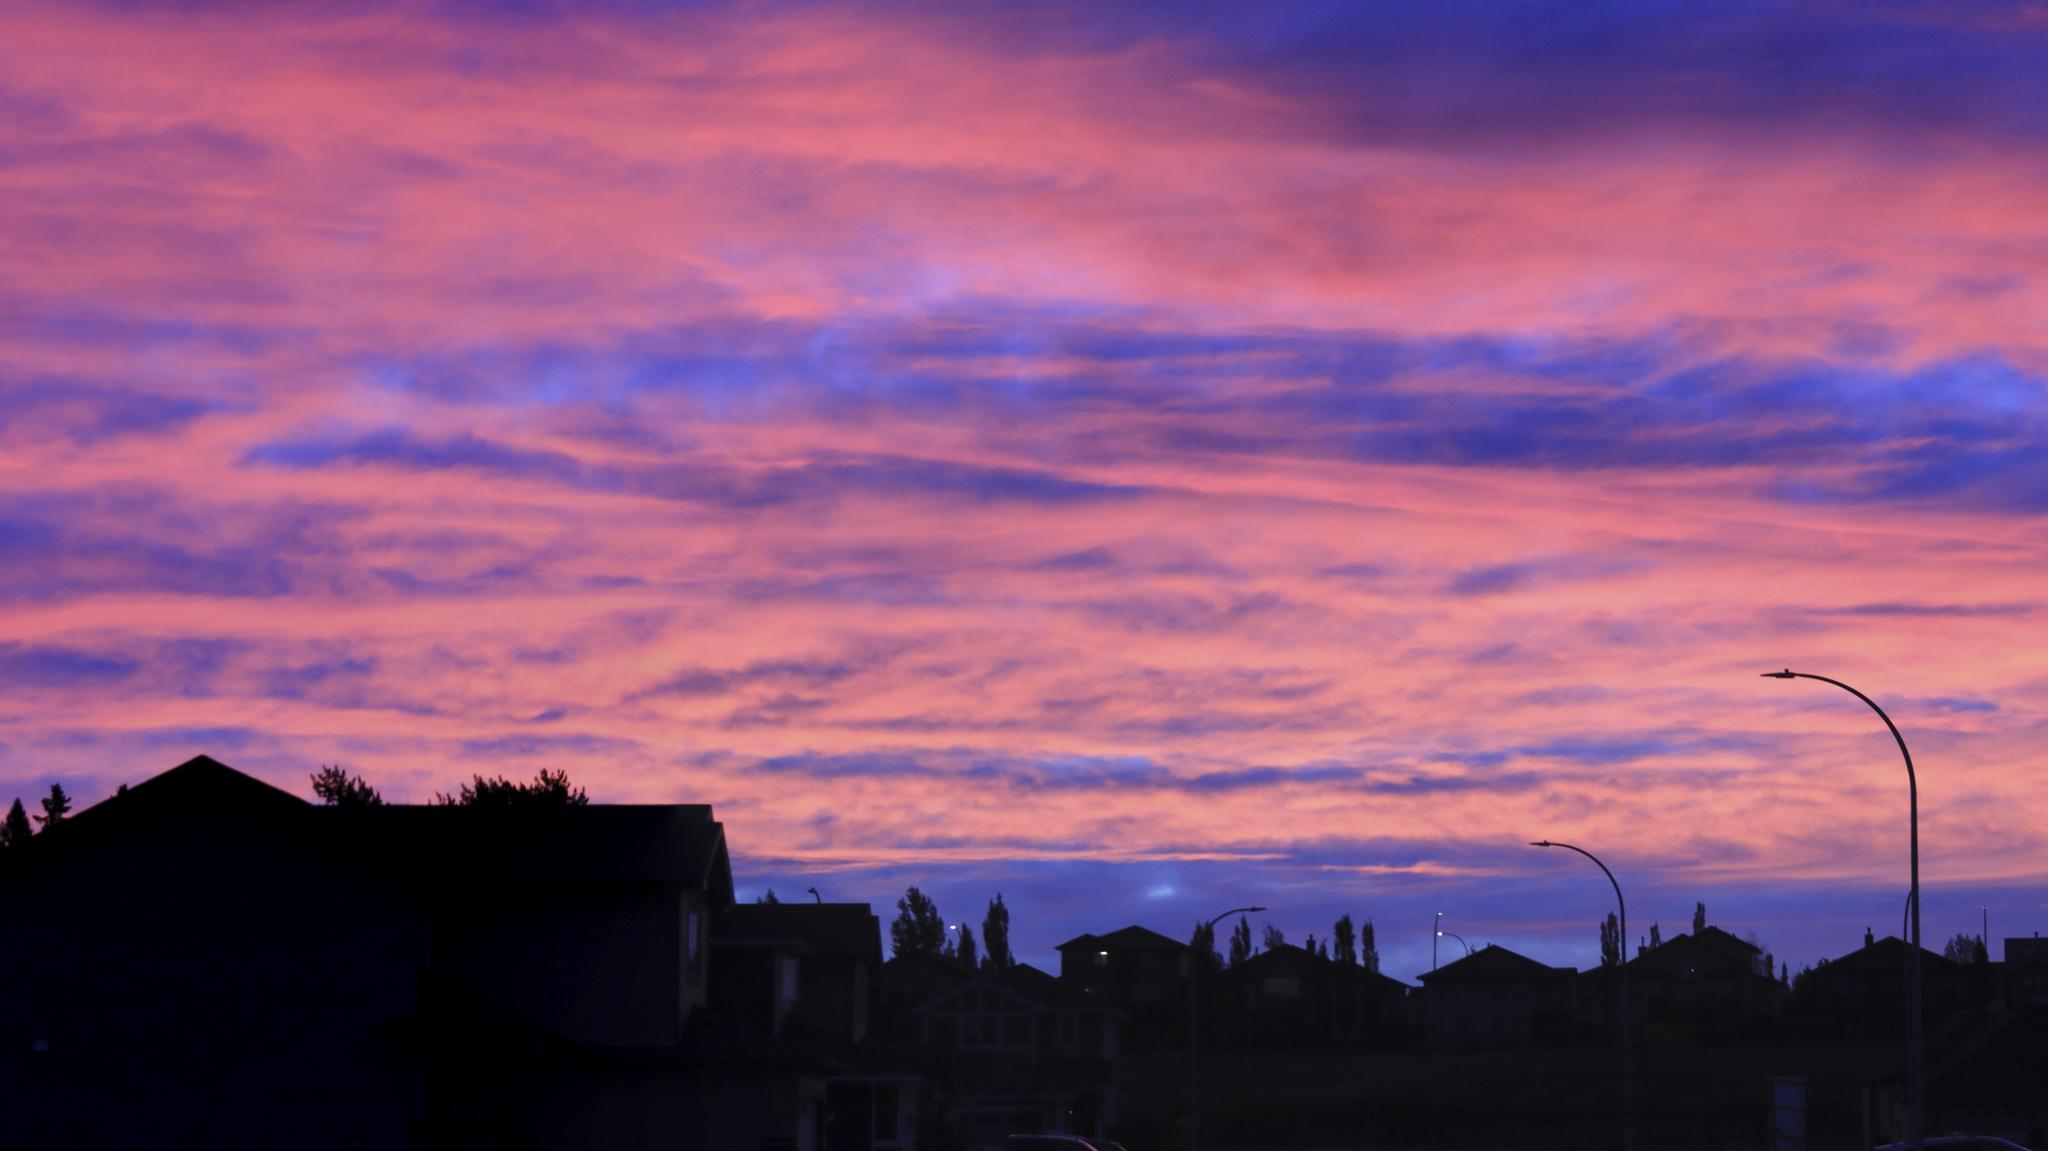 Strathmore Sunrise  - Doug Boyce